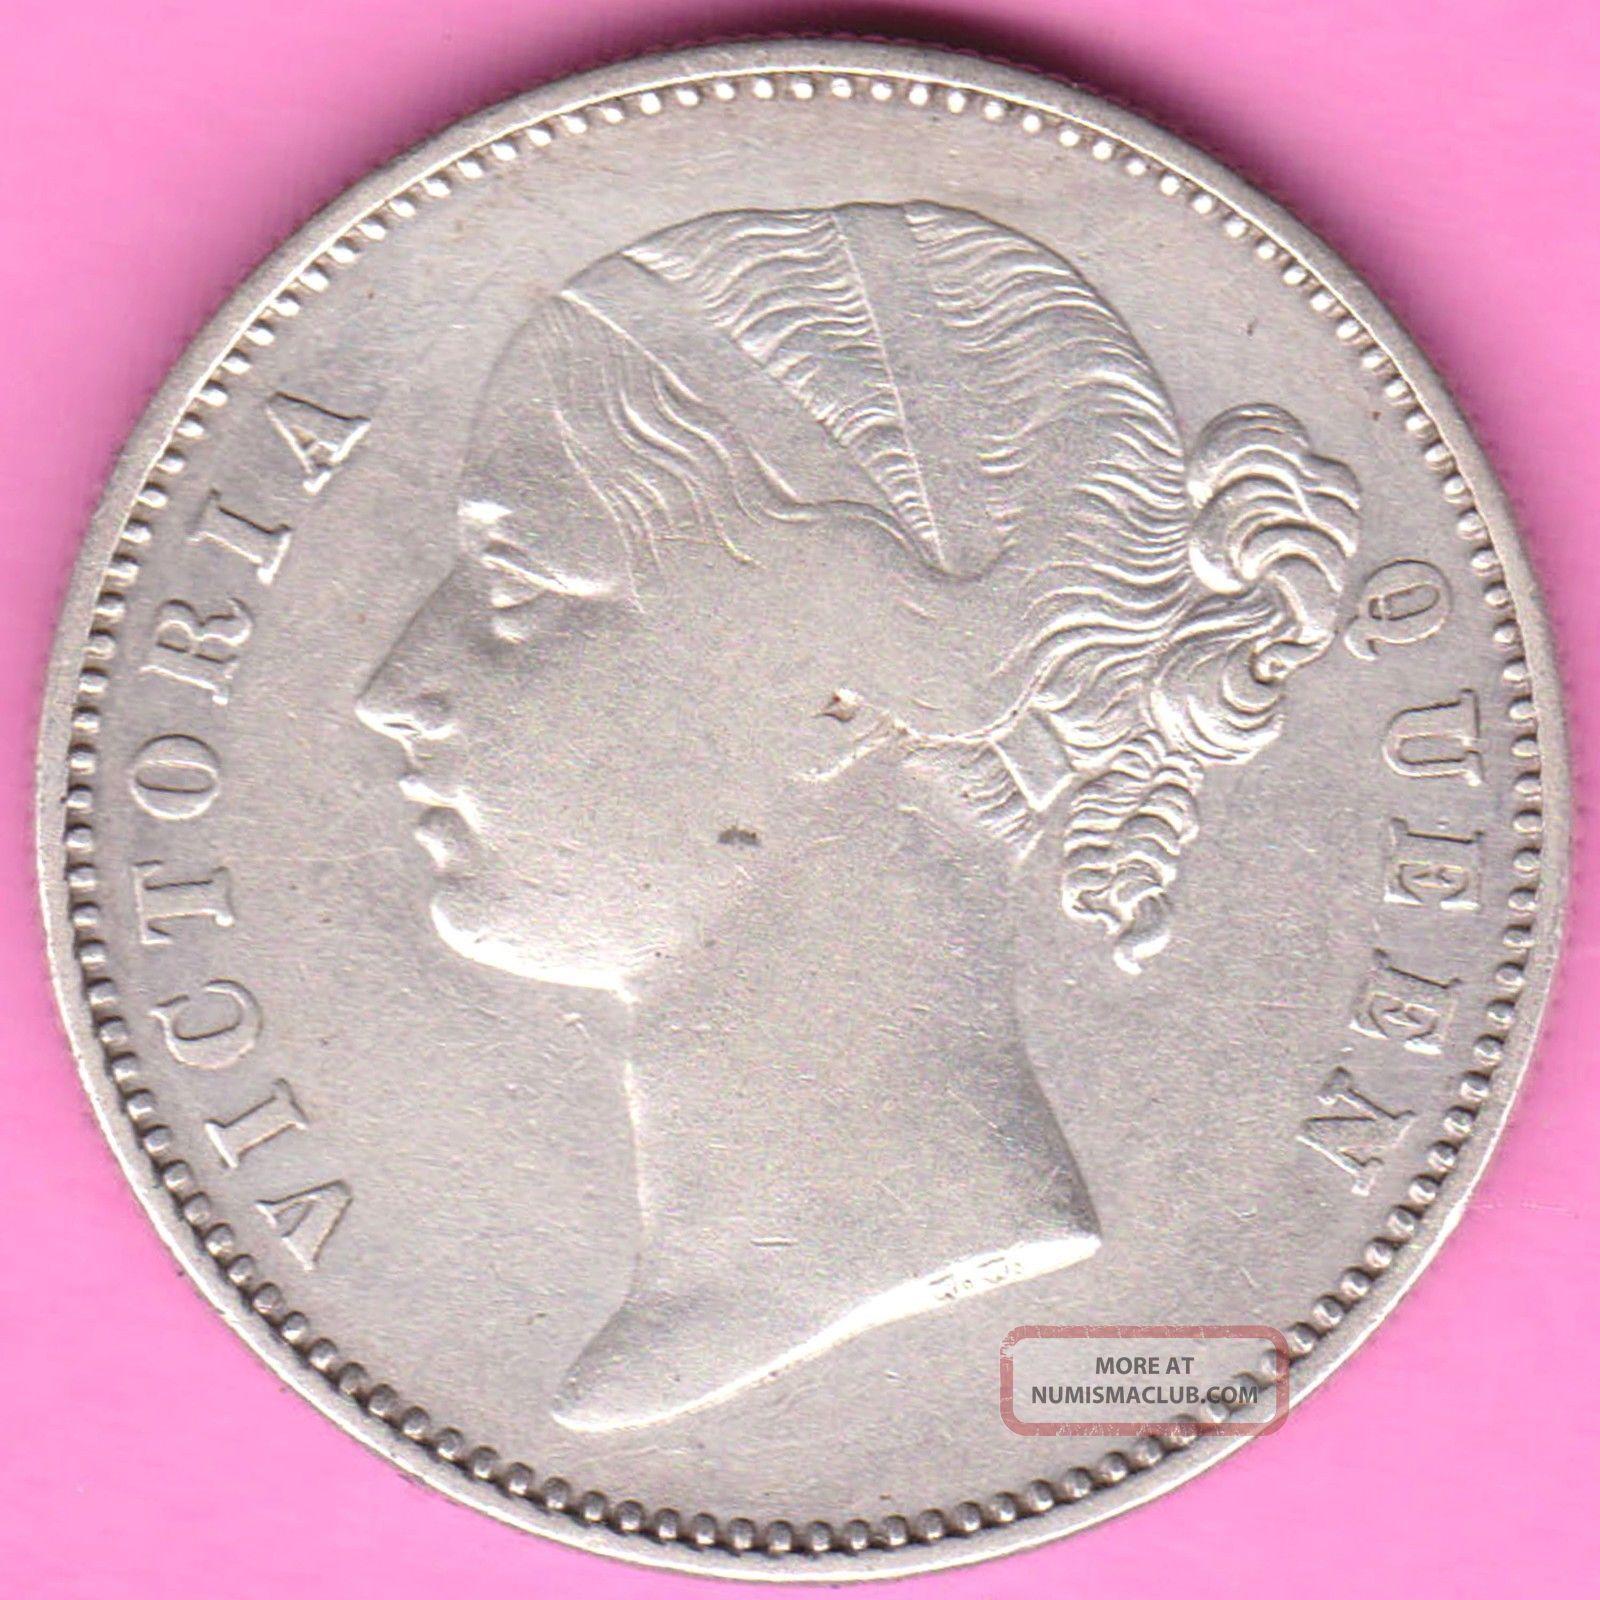 British India - 1840 - Divided Legend - One Rupee - Victoria - Rarest Silver Coin - 28 British photo